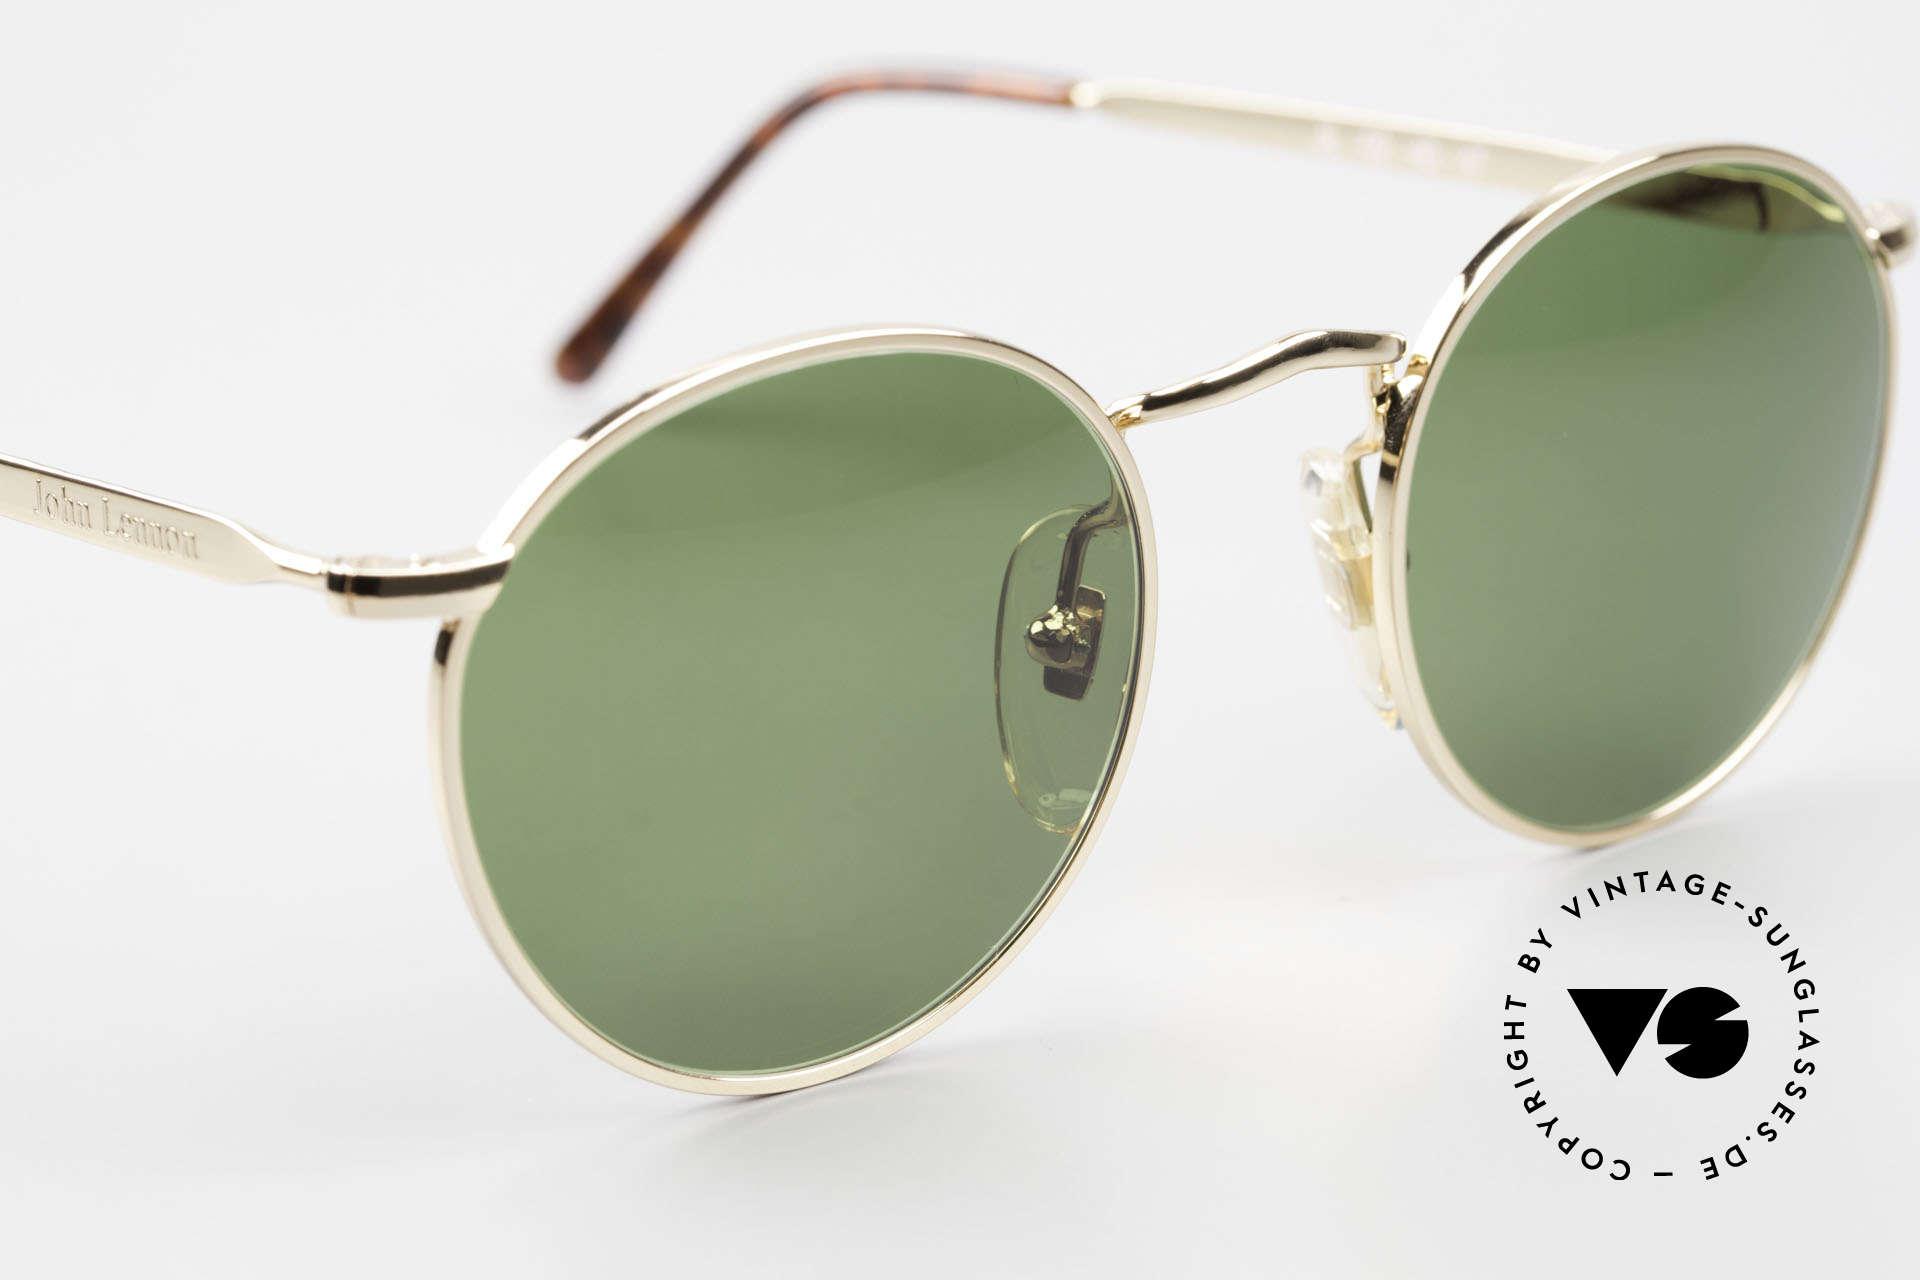 John Lennon - The Dreamer Original JL Collection Glasses, NO RETRO PANTO SUNGLASSES; but a rare old Original, Made for Men and Women